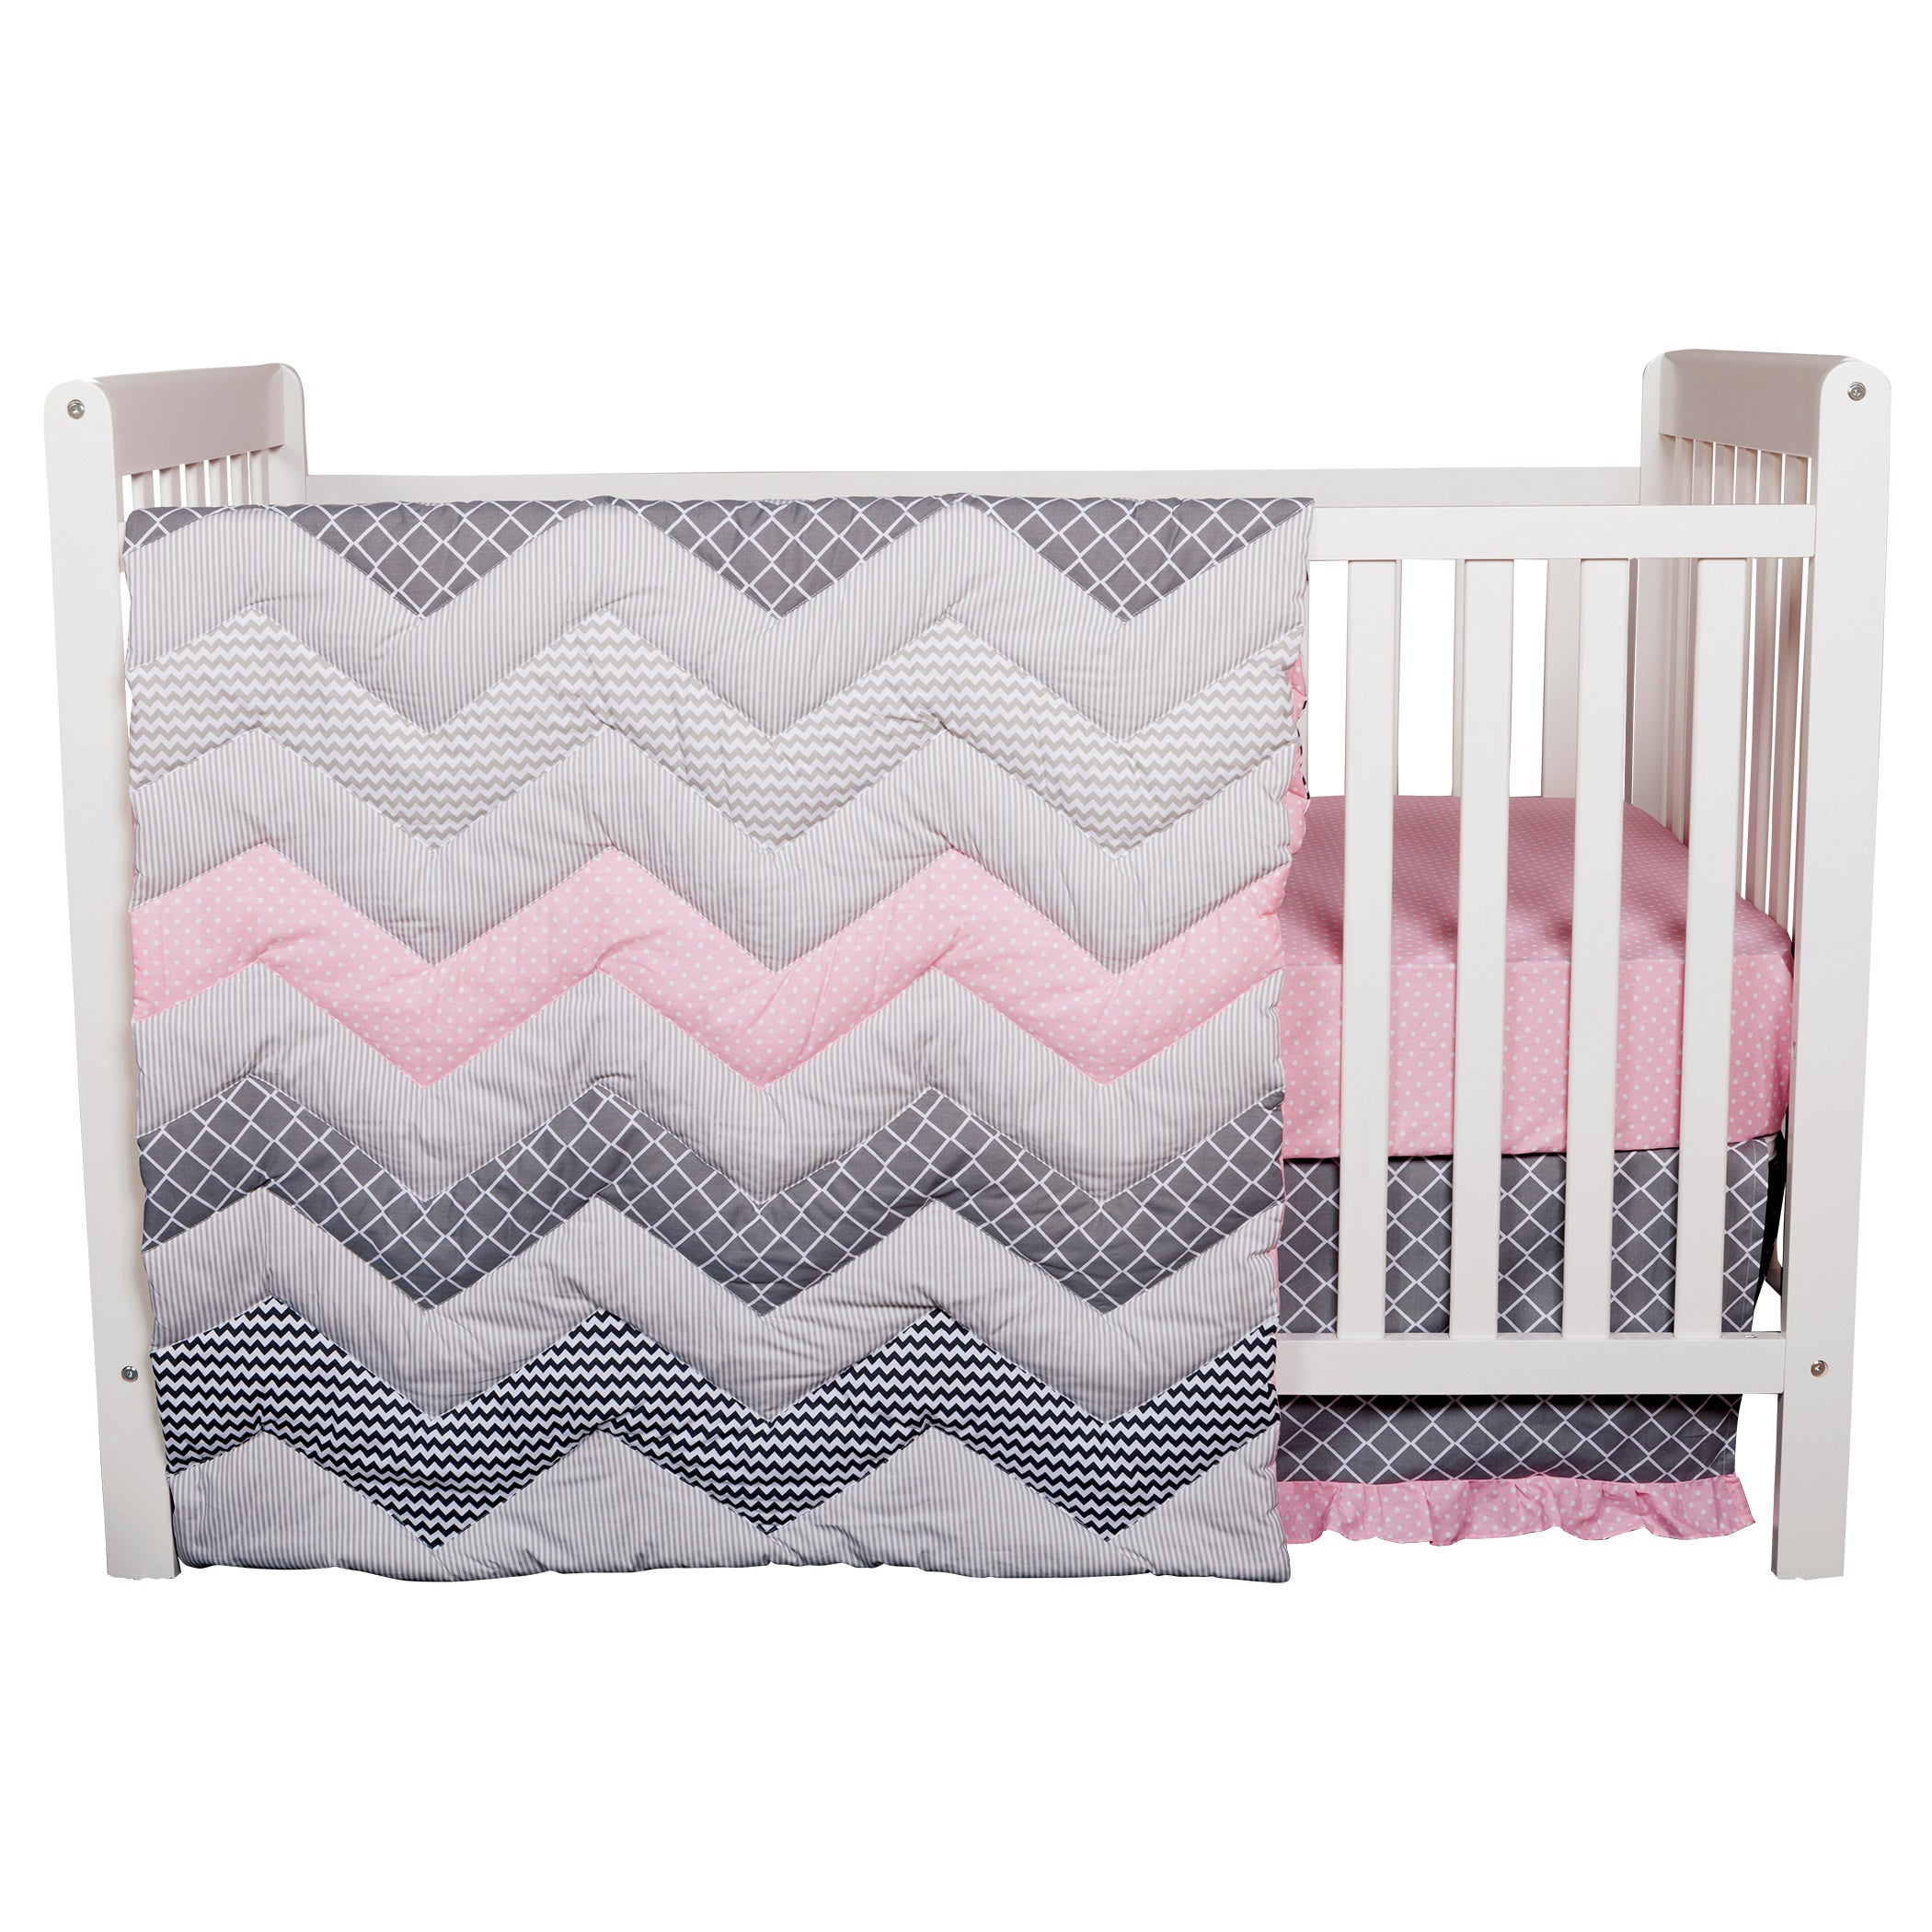 Trend Lab Cotton Candy Chevron 3 Piece Crib Bedding Set Free Shipping Today 10367705